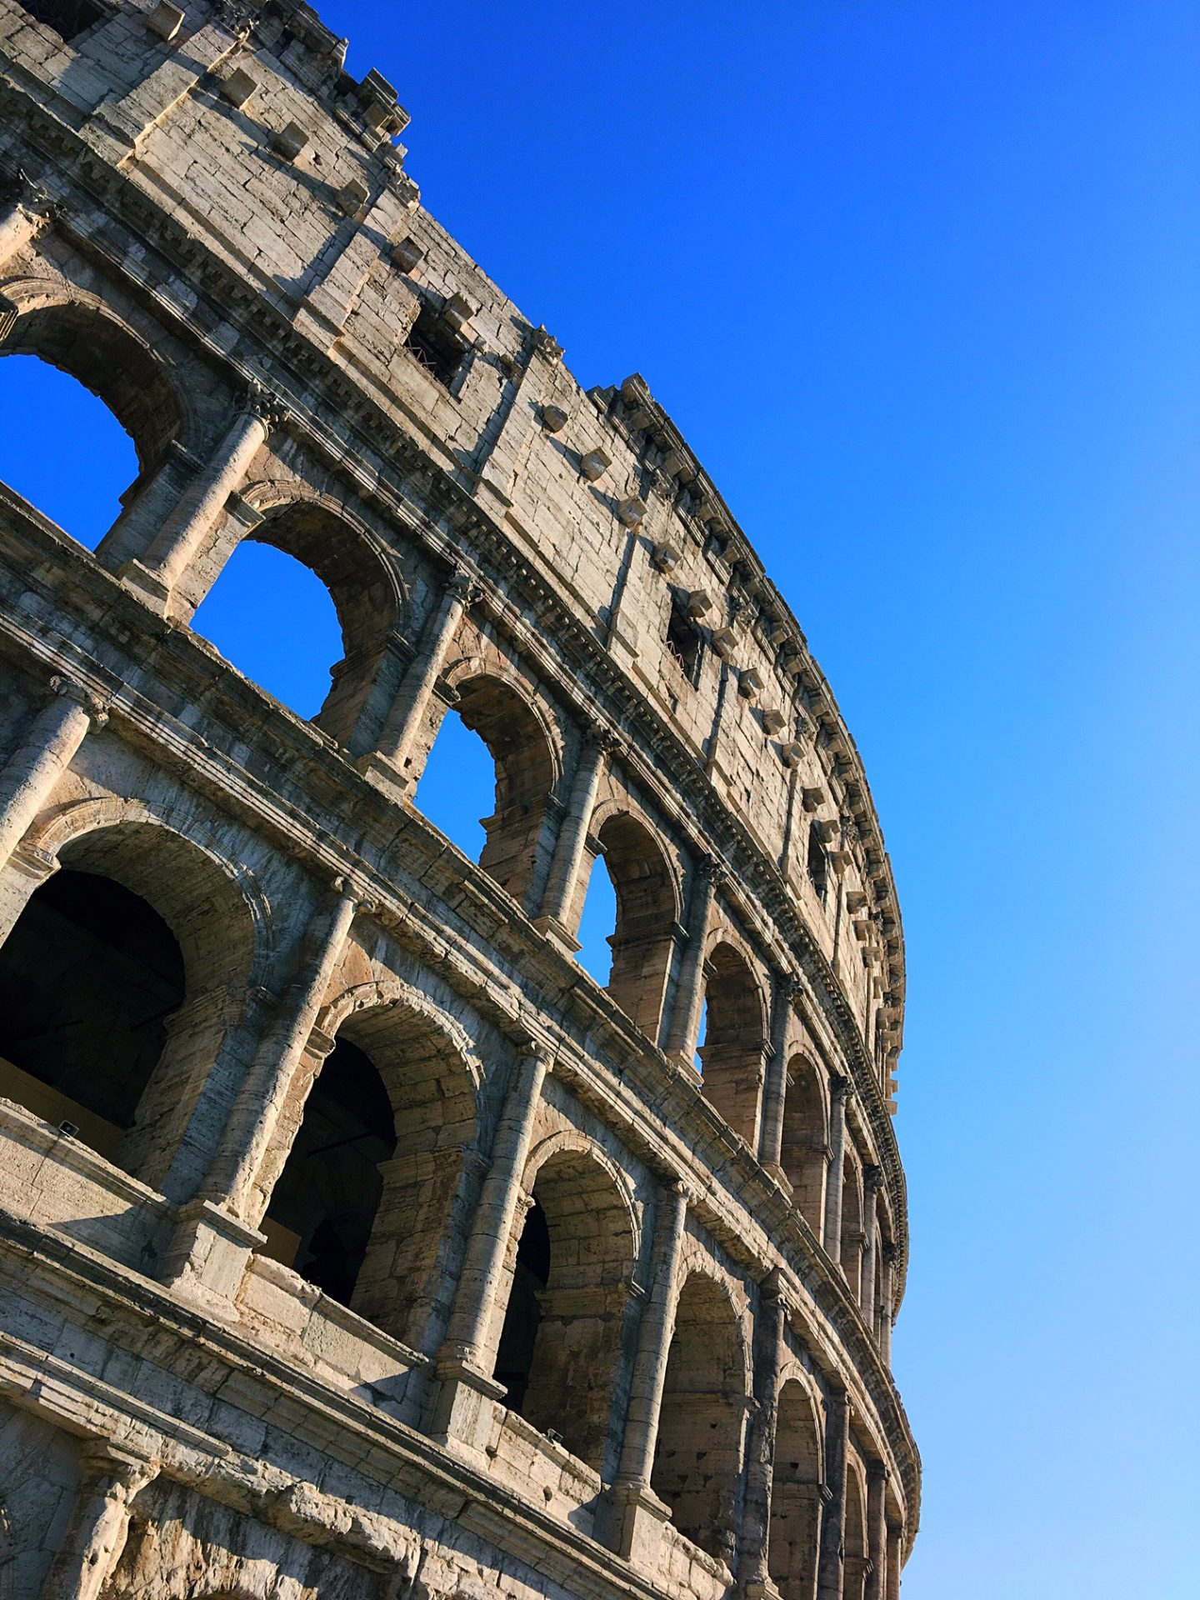 Rome Colosseum, colisseum Rome